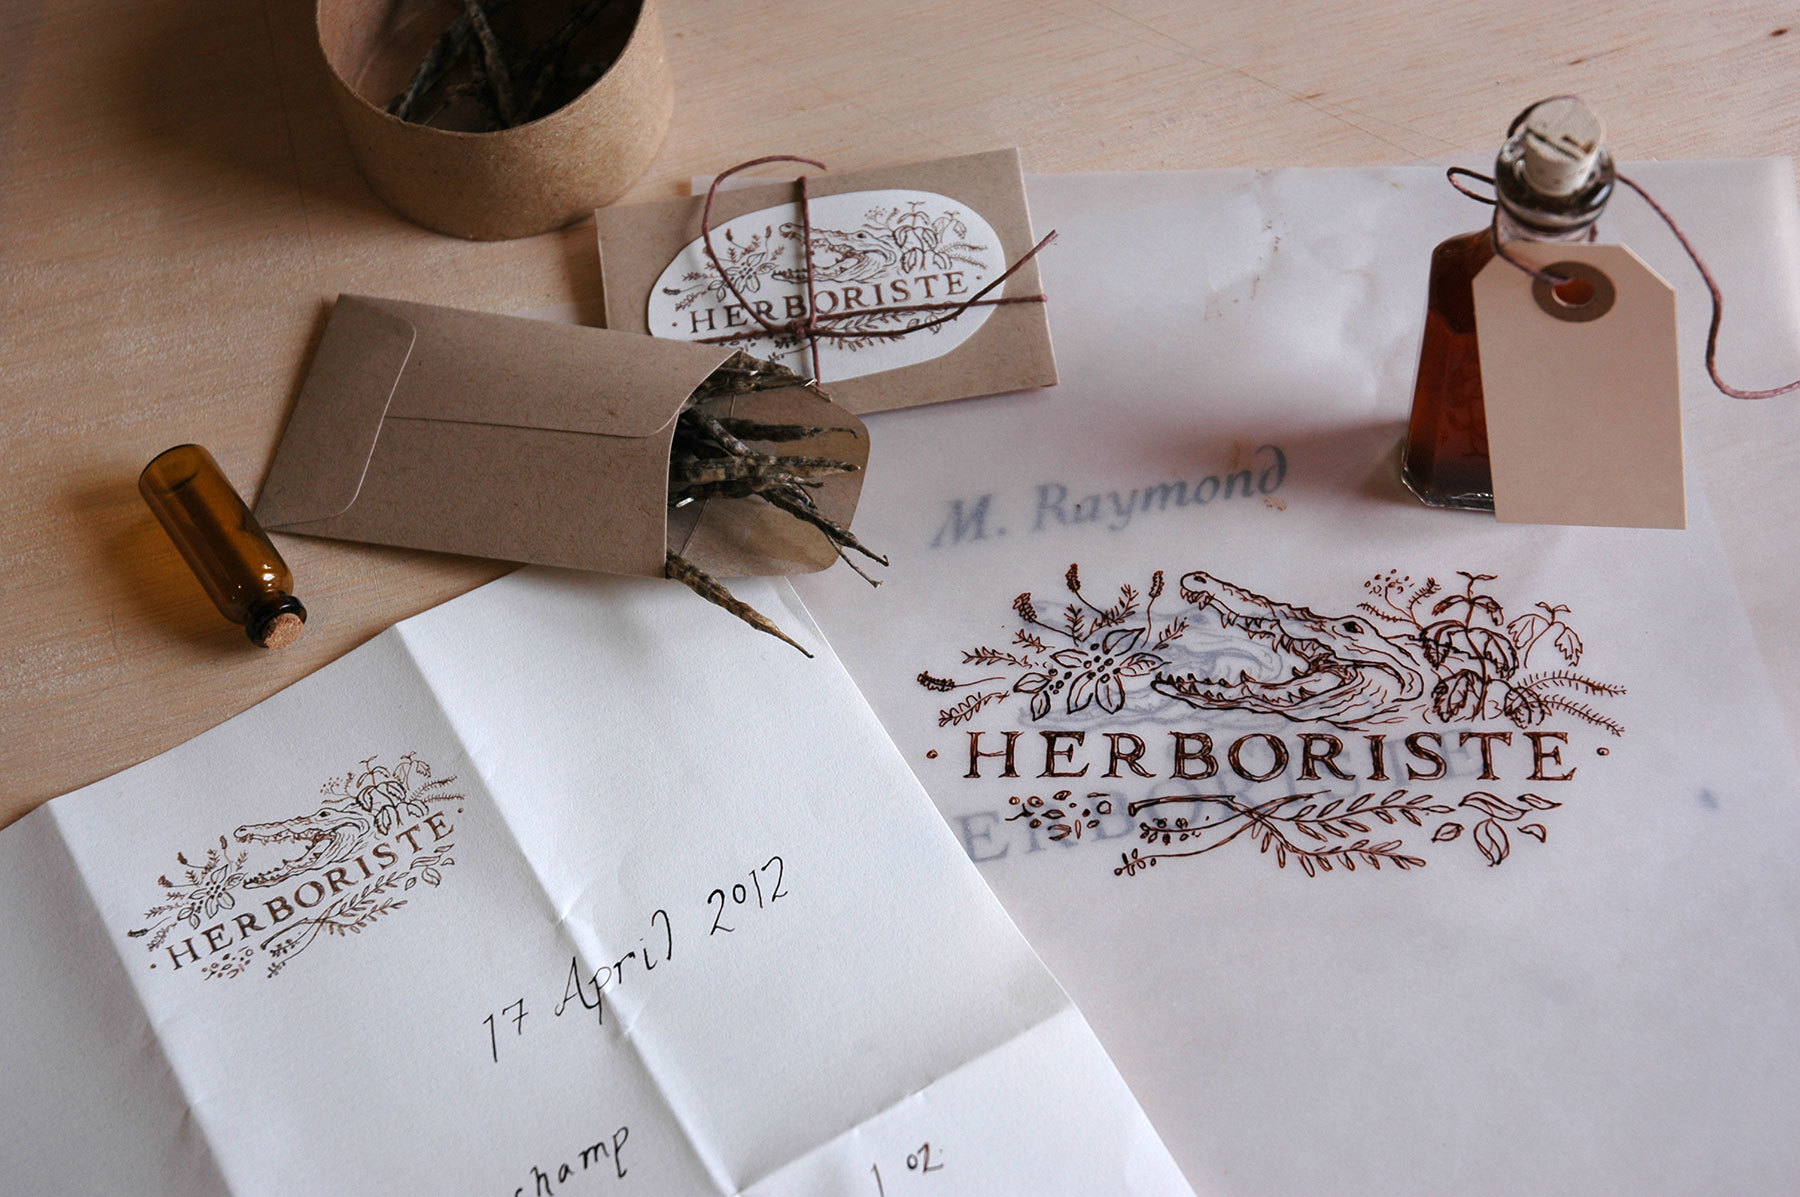 Herboriste by Liz Gill Neilson